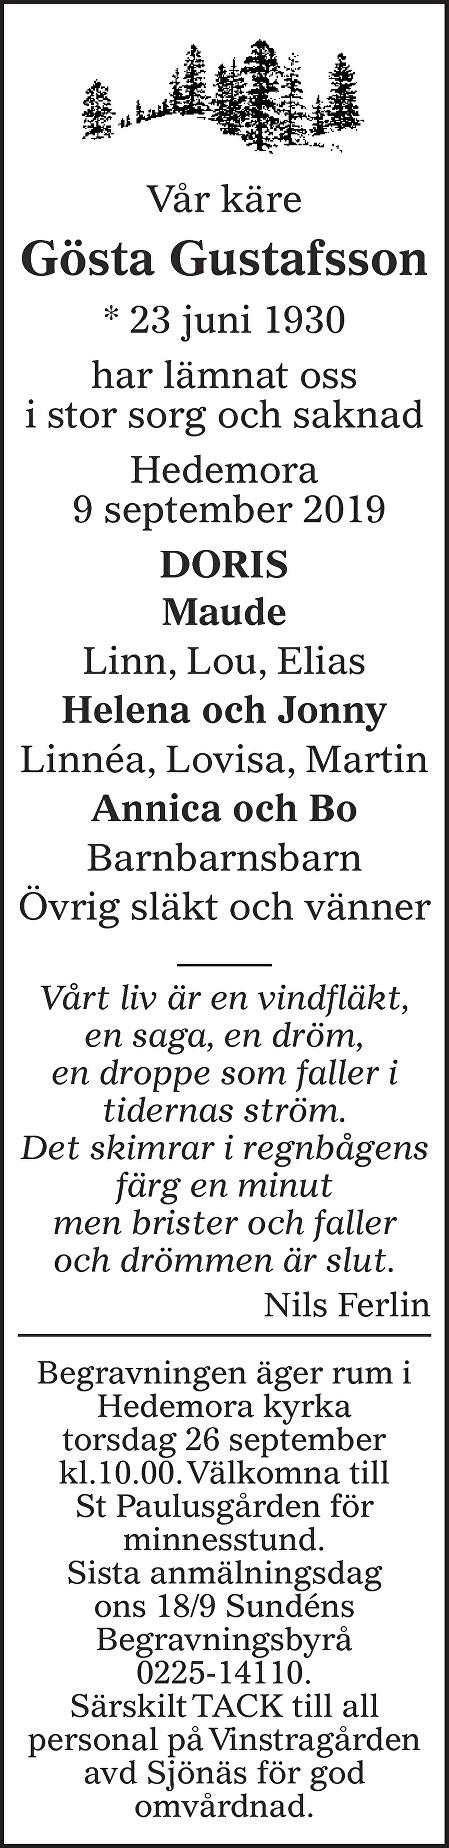 Gösta Gustafsson Death notice